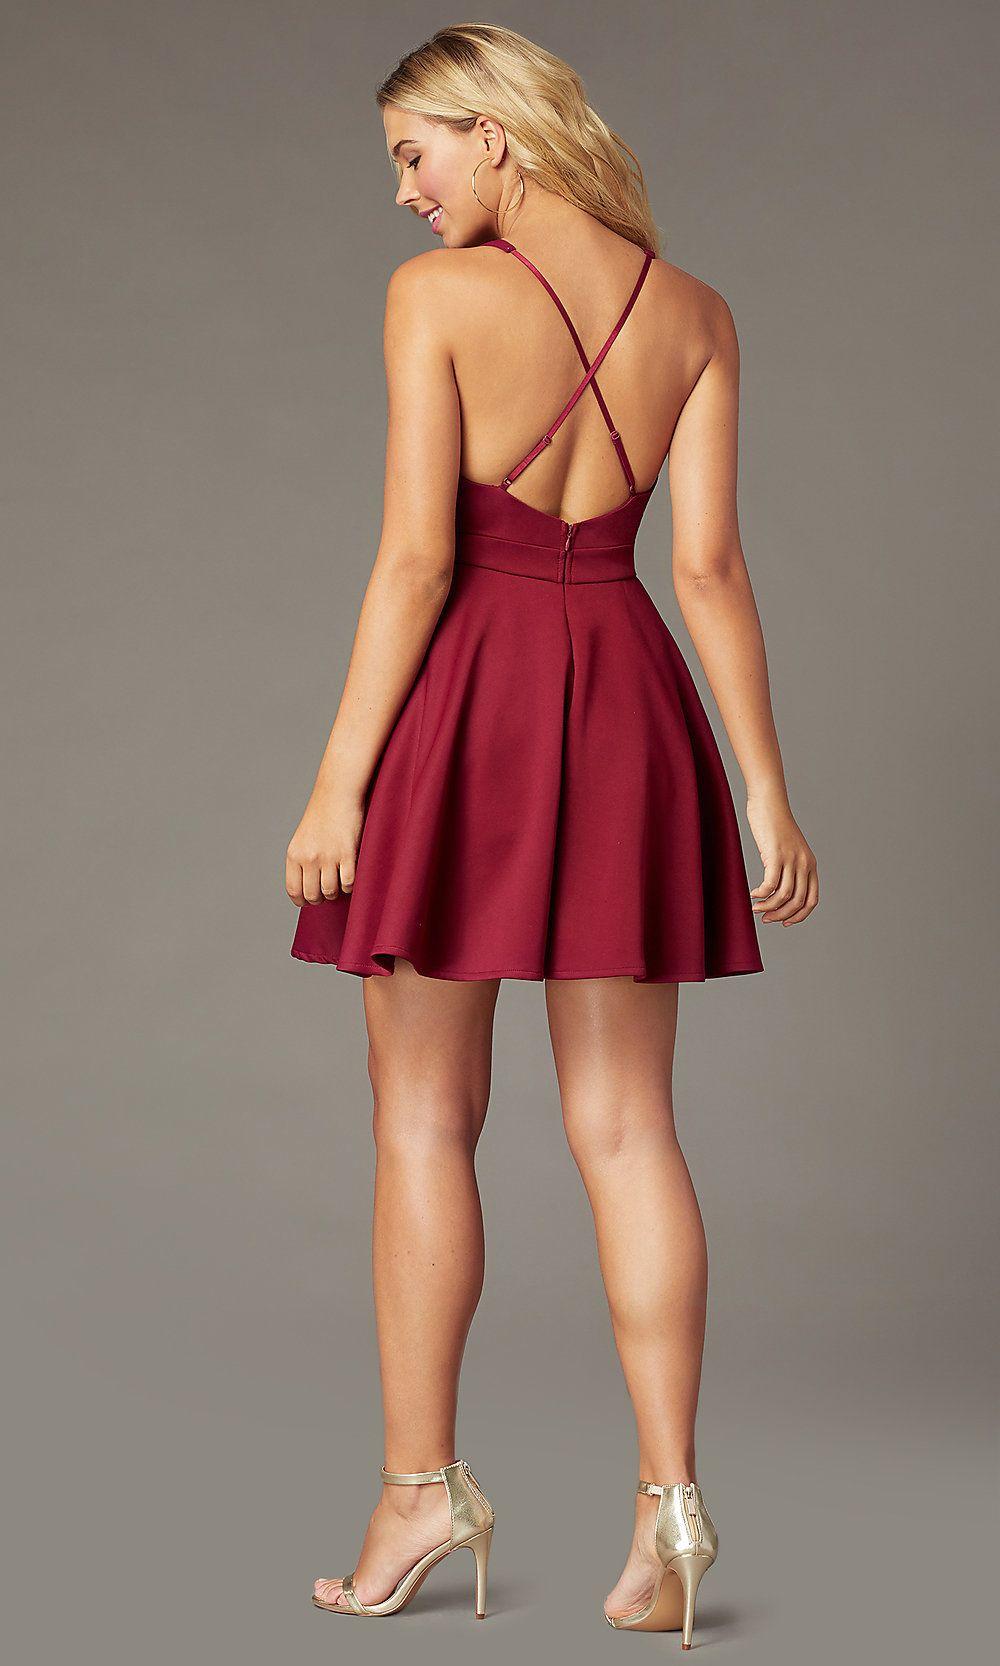 Garnet Red Tiered-Skirt Short V-Neck Party Dress